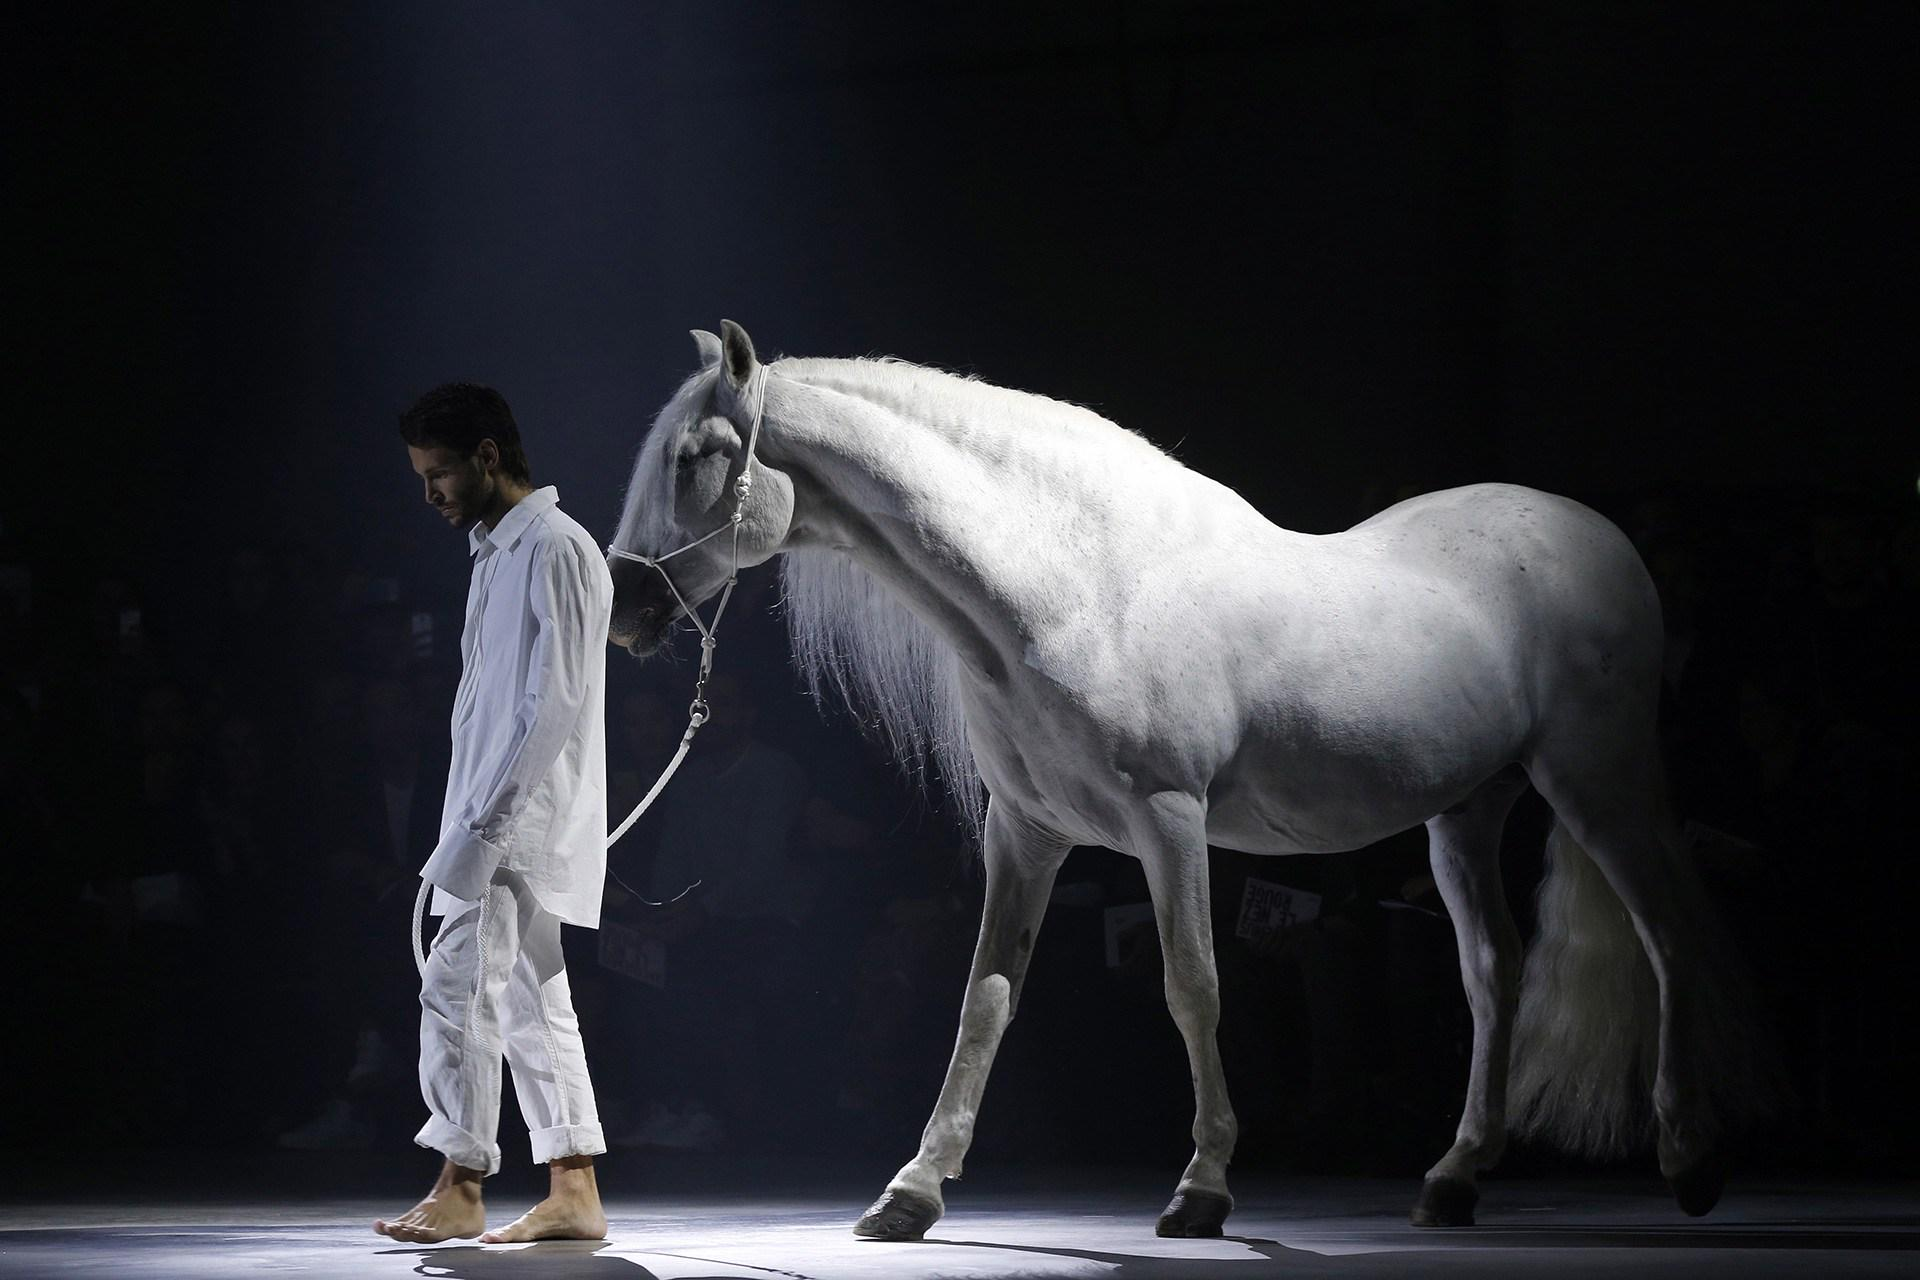 Alexa meets one of the hottest names on the fashion scene, Simon Porte Jacquemus - http://t.co/ODbOmIFLQ2 http://t.co/auTug1BcIm